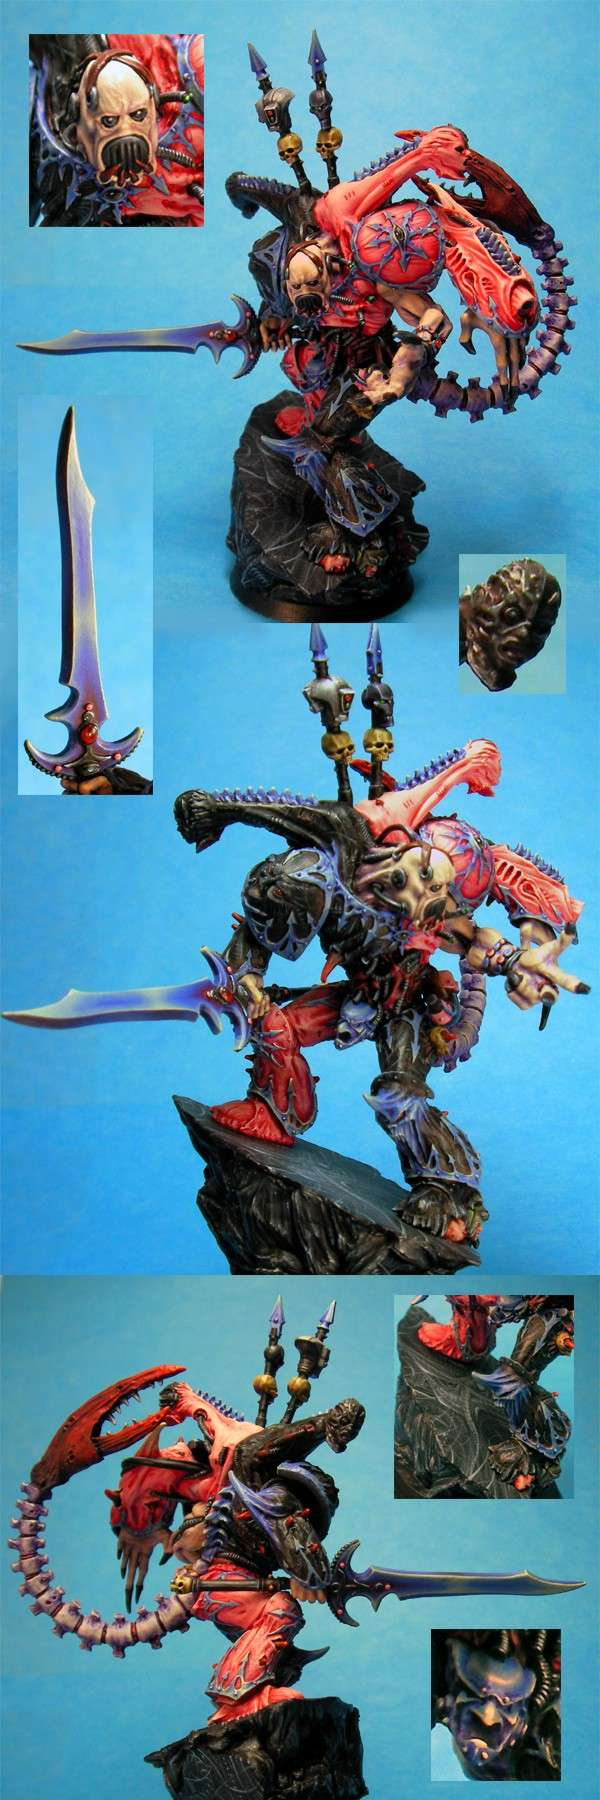 Slaaneshi-esque Daemon prince